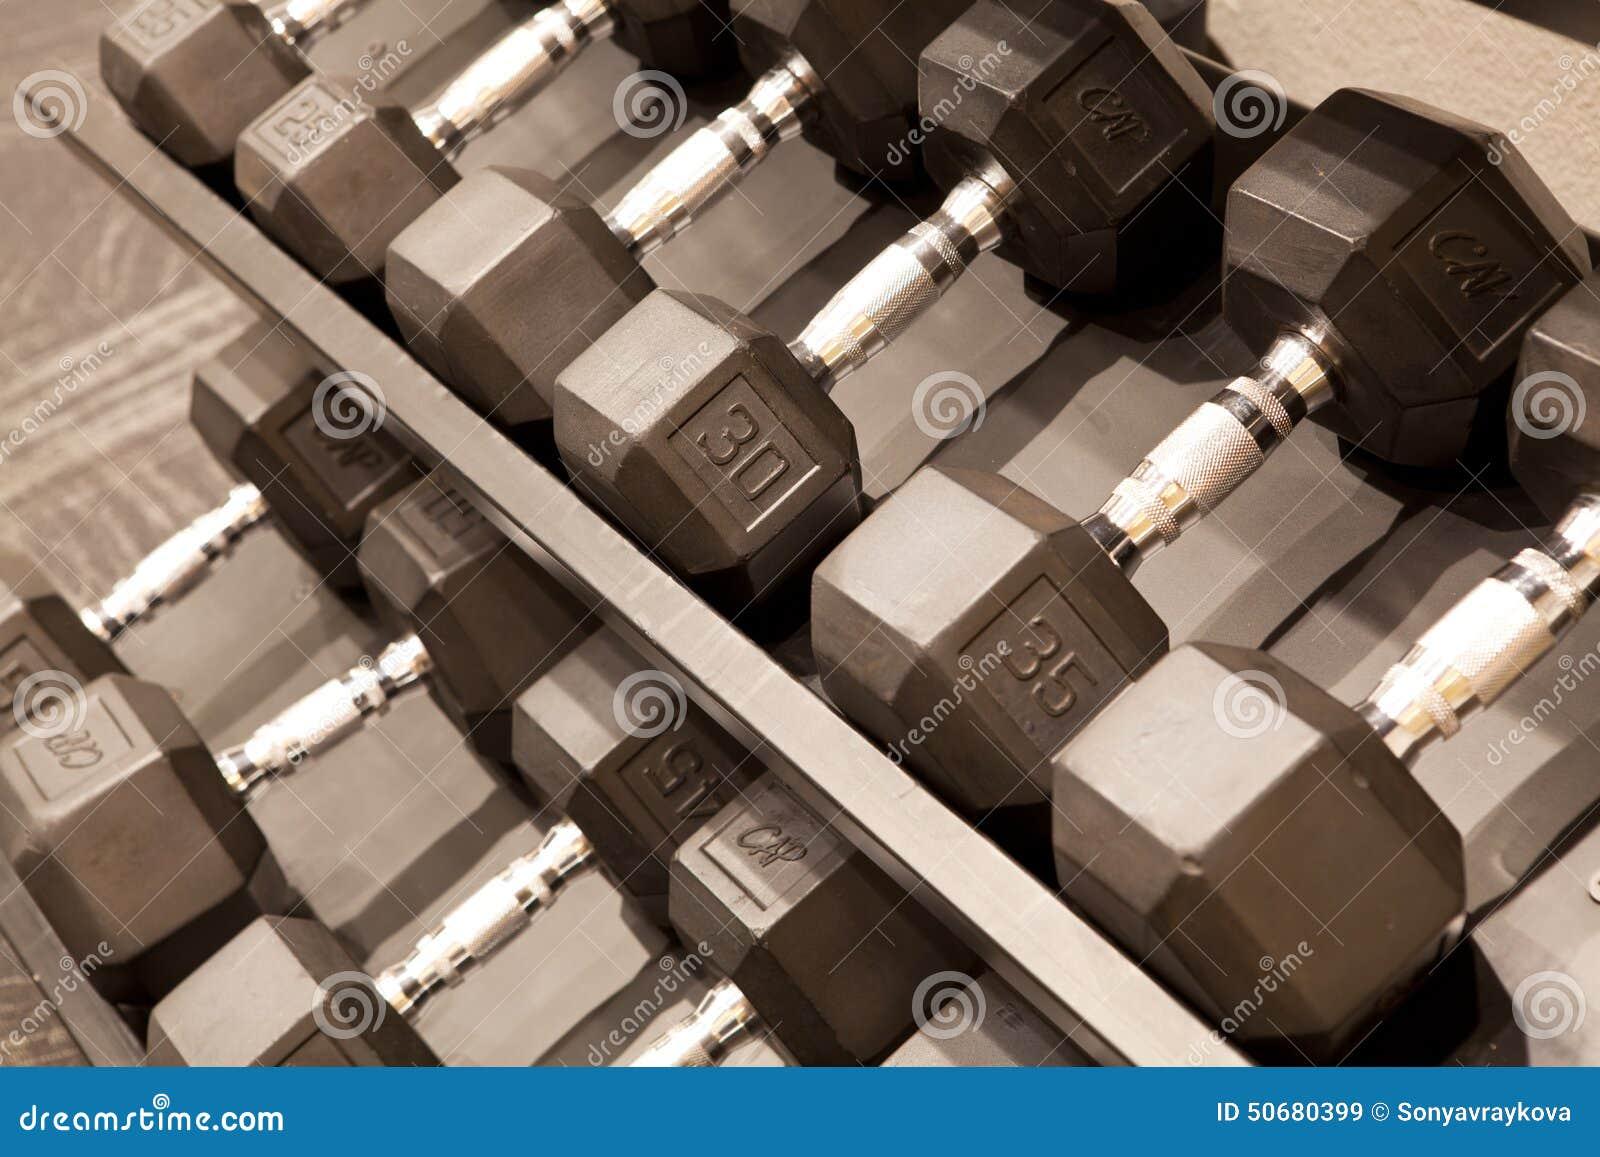 Download 哑铃 库存图片. 图片 包括有 关闭, 健身, 大厅, 重量, 哑铃, 培训, 体操, 不同, 体育运动 - 50680399